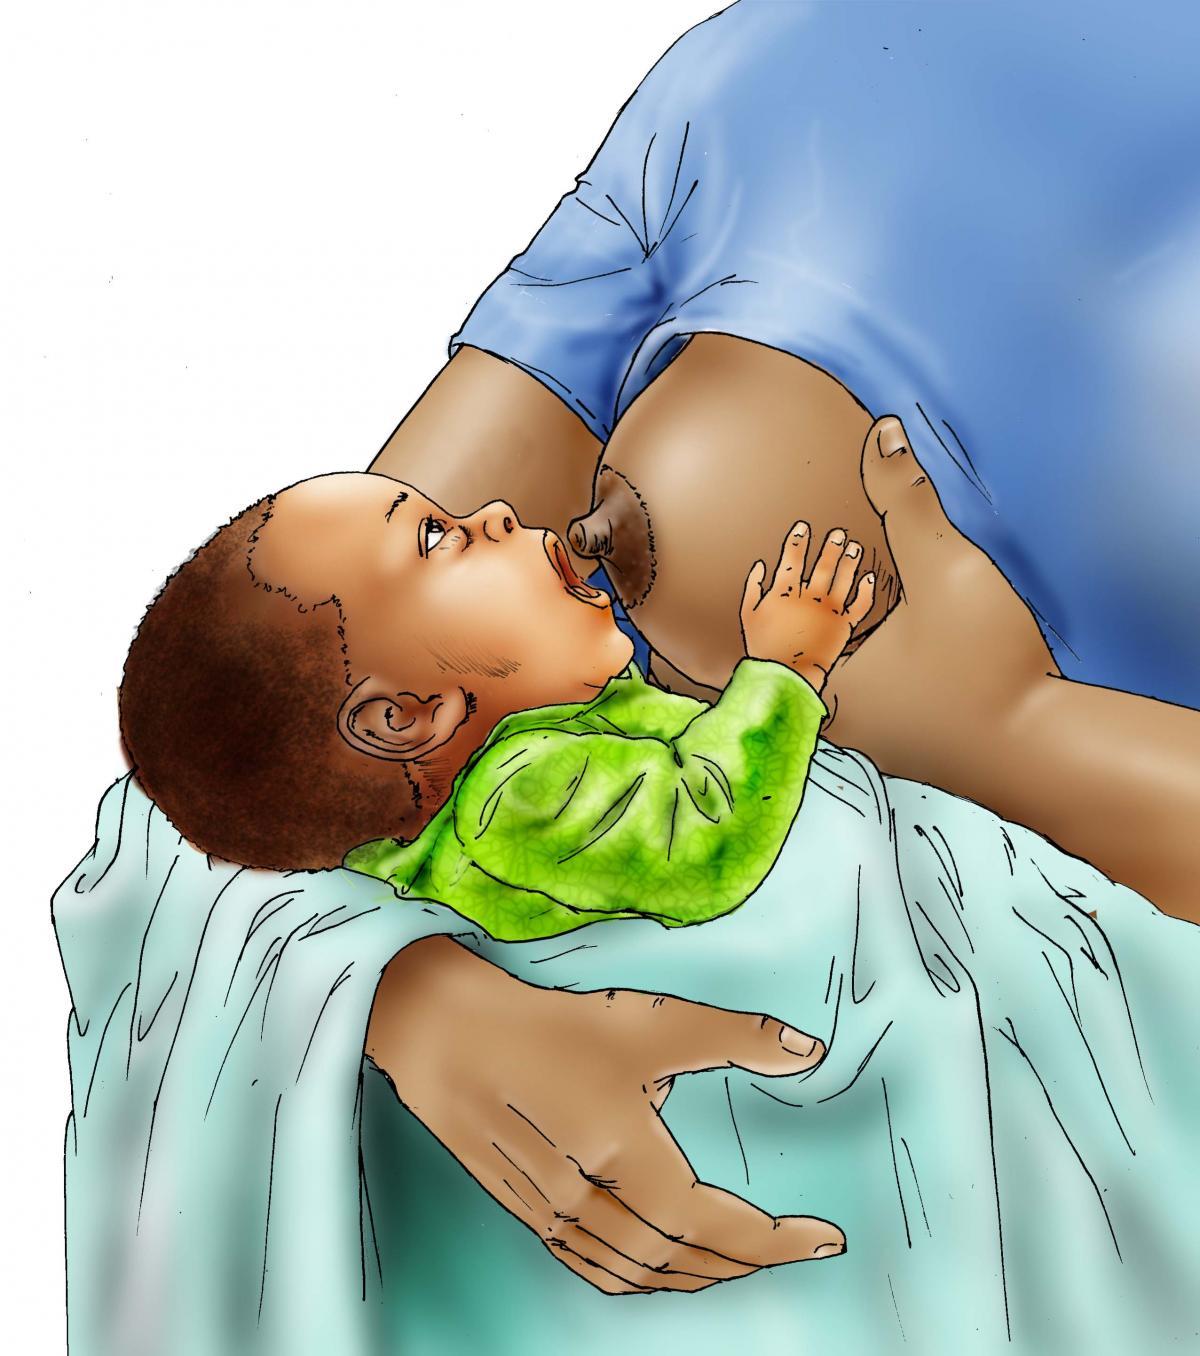 Breastfeeding - Breastfeeding pre-attachment 0-6 mo - 05C - Nigeria